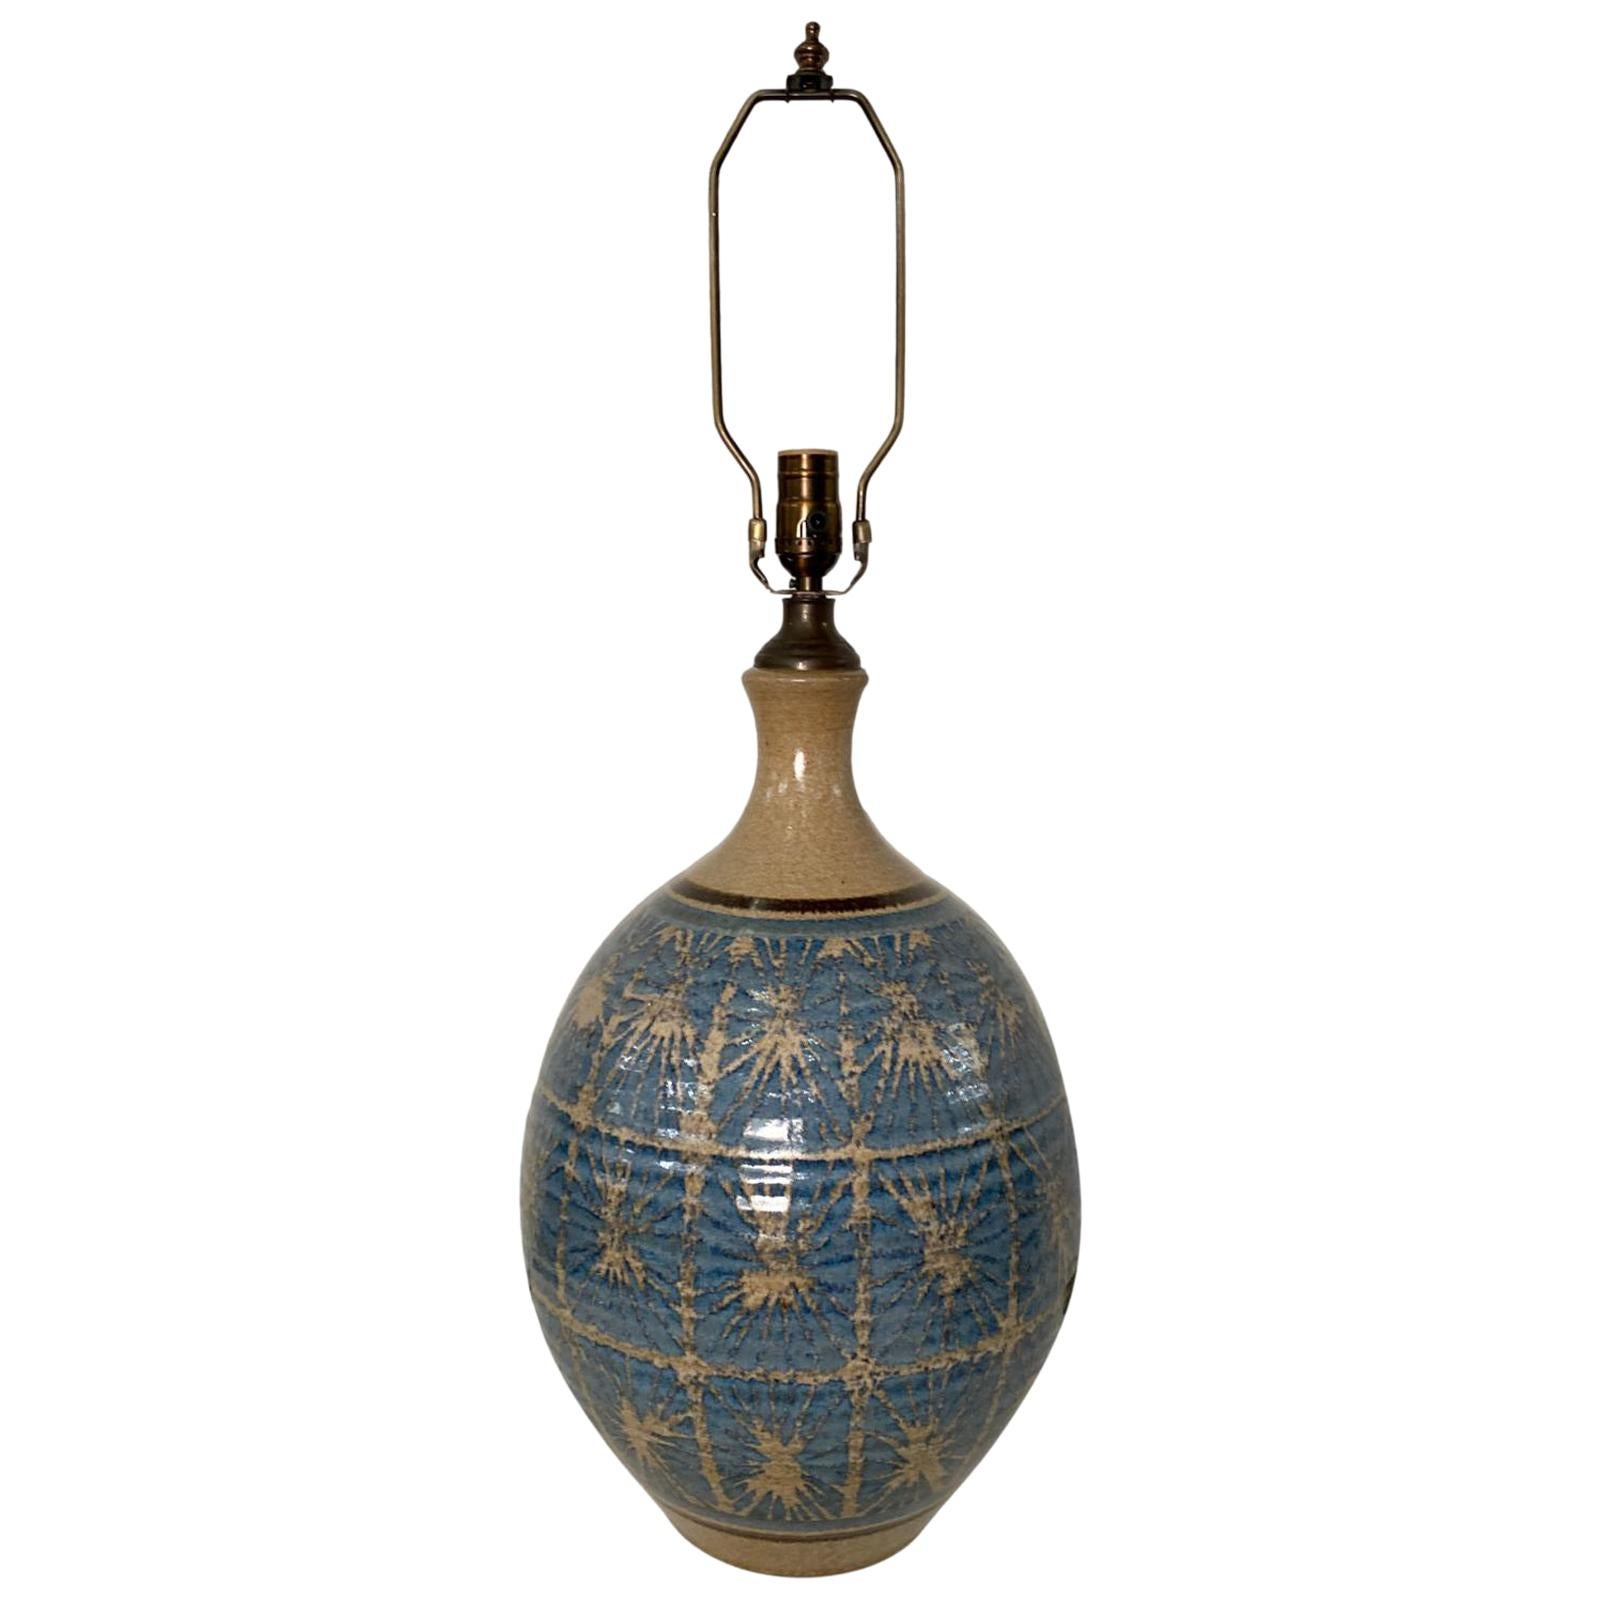 Large Midcentury Italian Ceramic Table Lamp